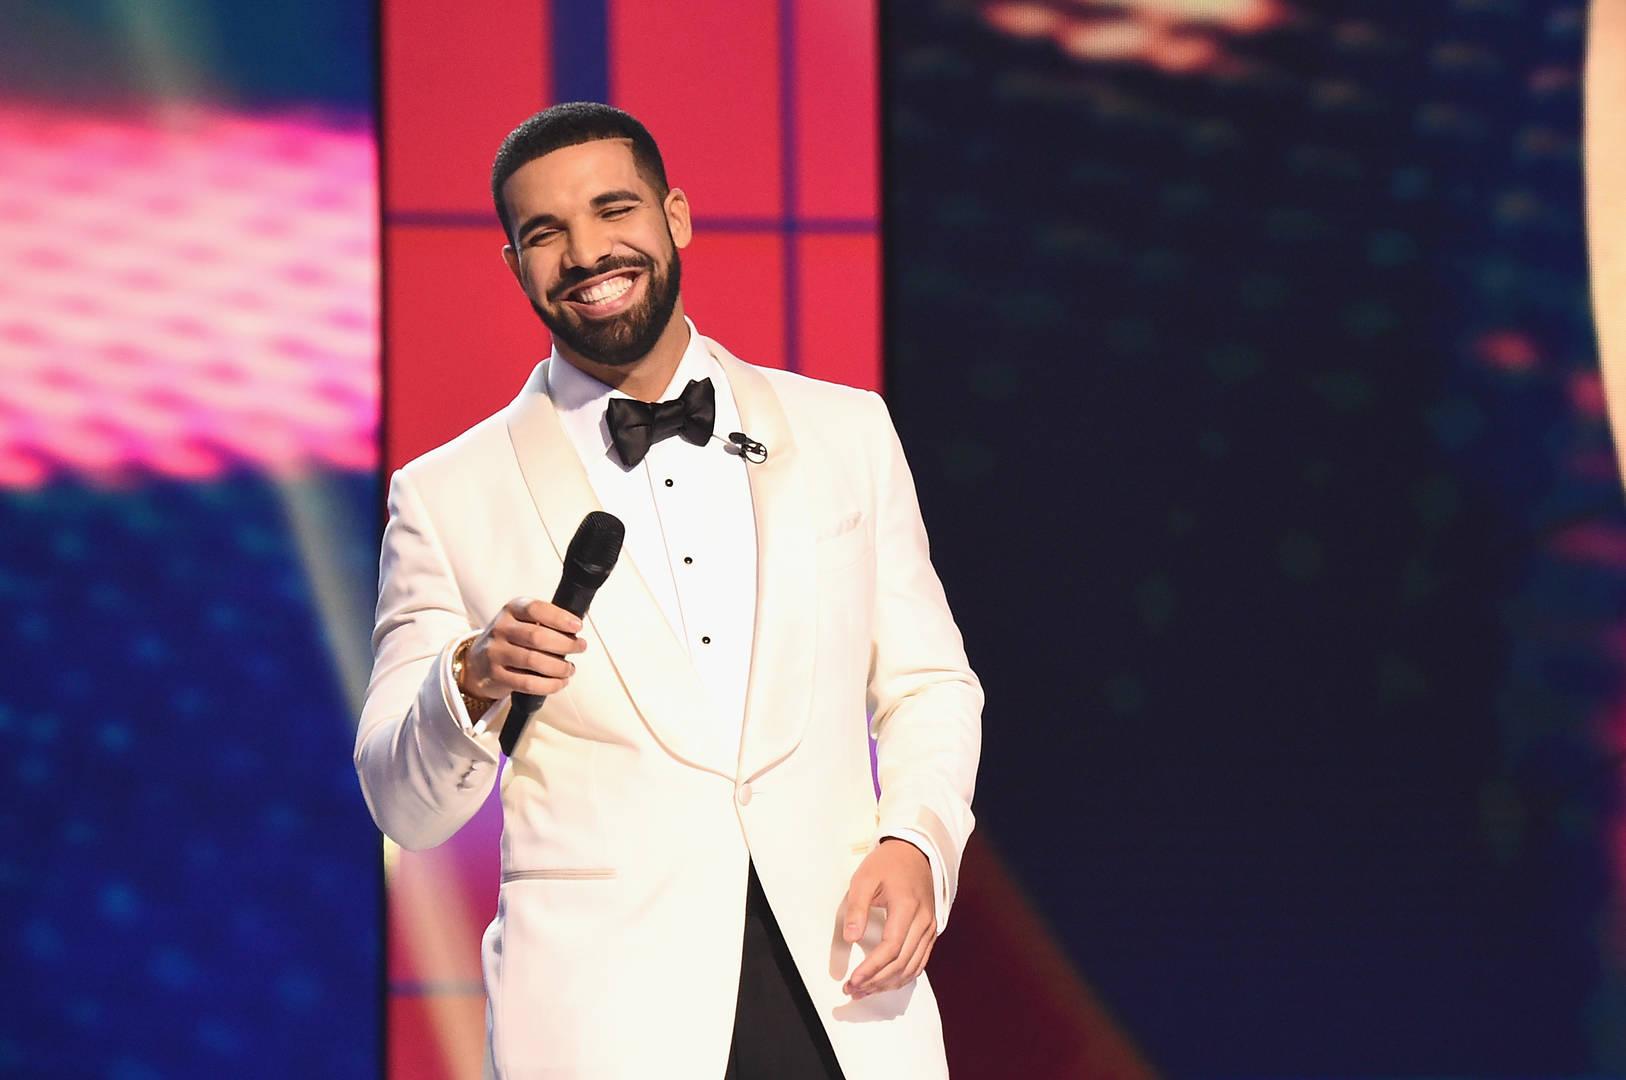 Drake, garçon amoureux certifié